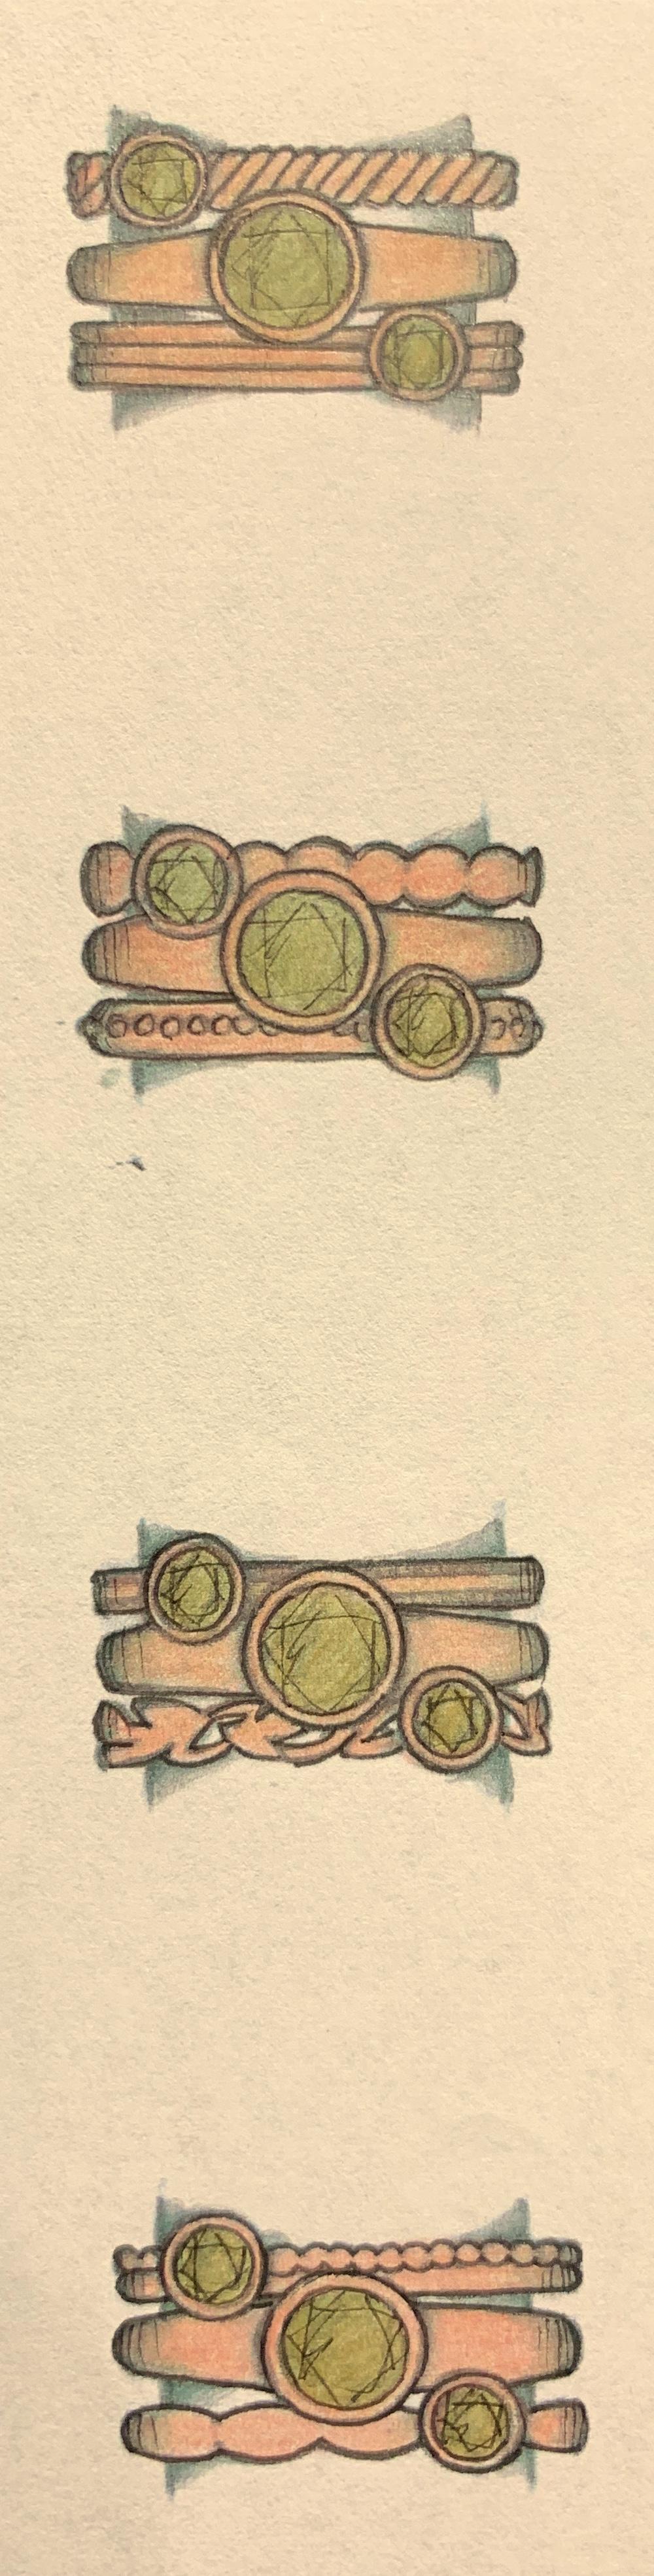 Slight variations on a stacking ring set.